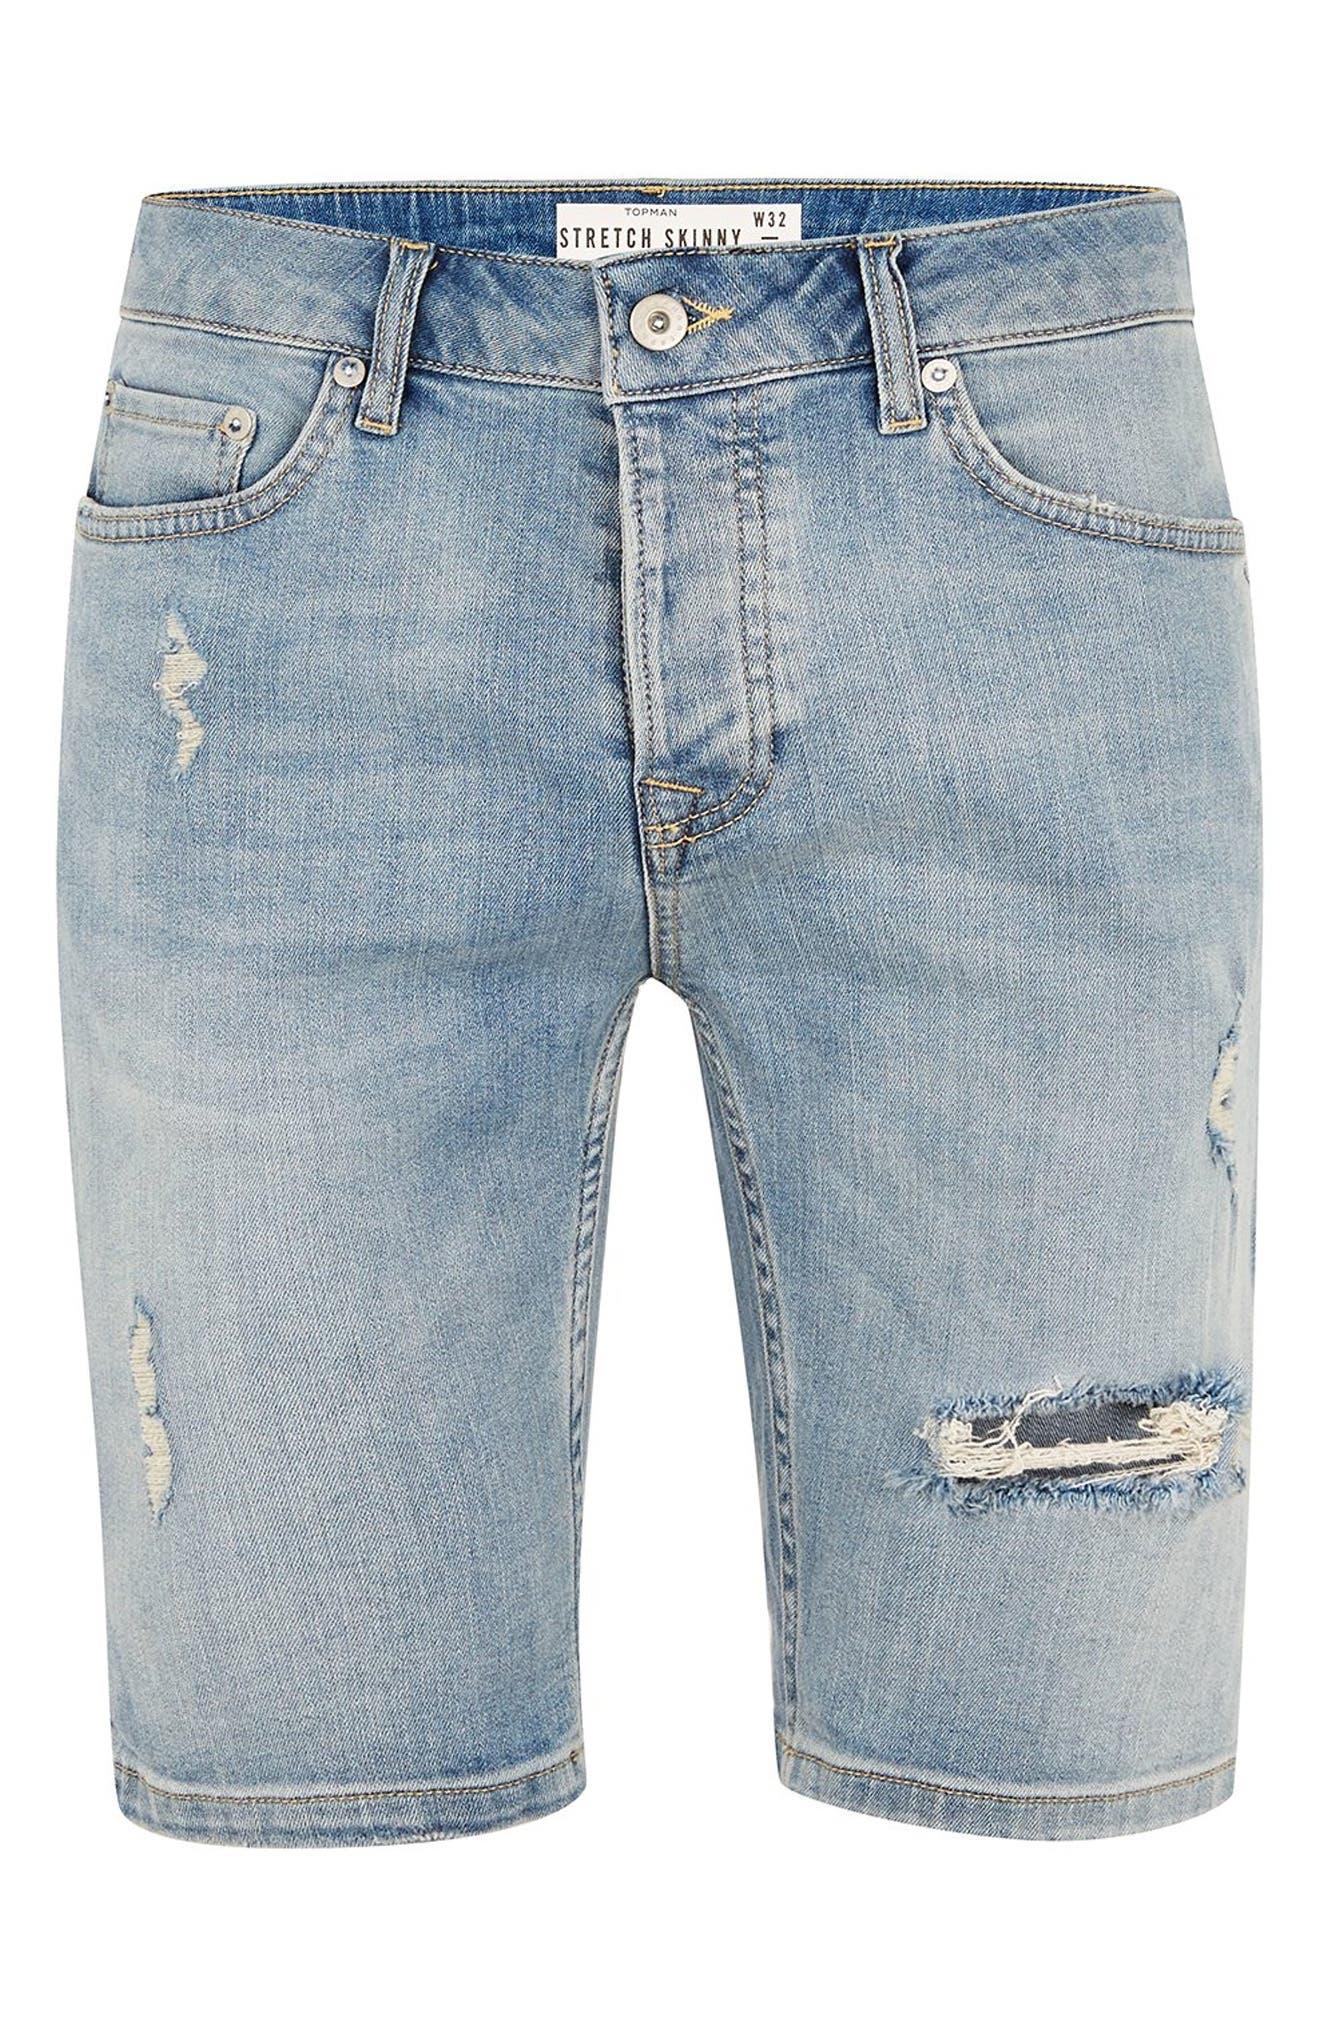 Bleach Ripped Skinny Denim Shorts,                             Alternate thumbnail 4, color,                             400